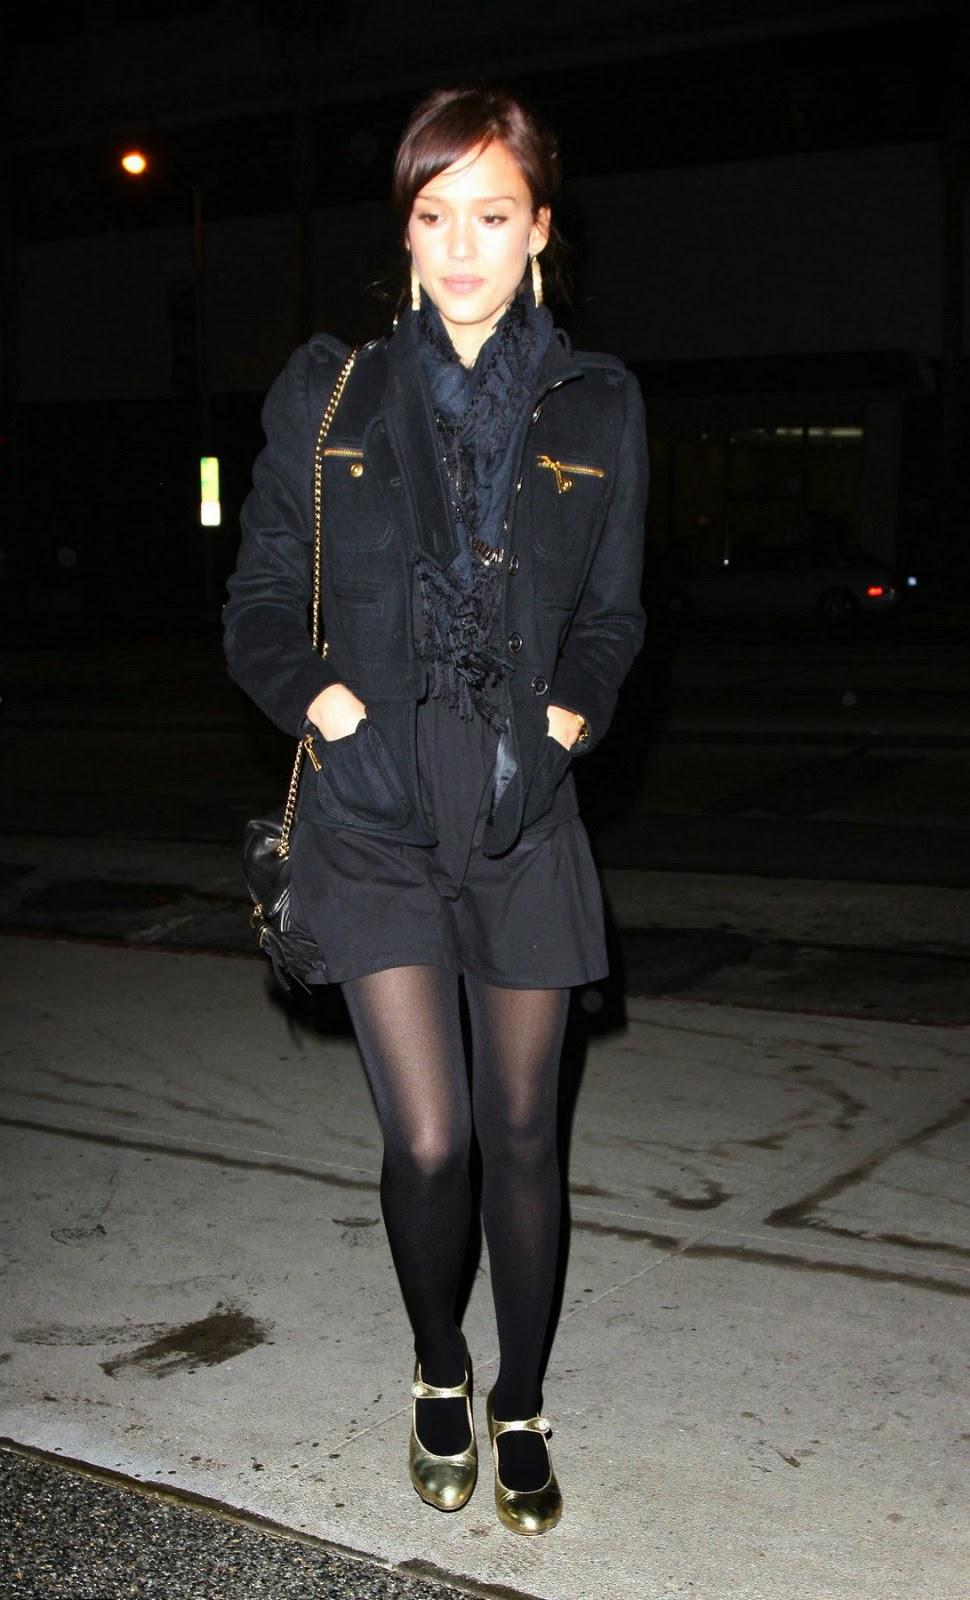 Jessica alba wearing pantyhose